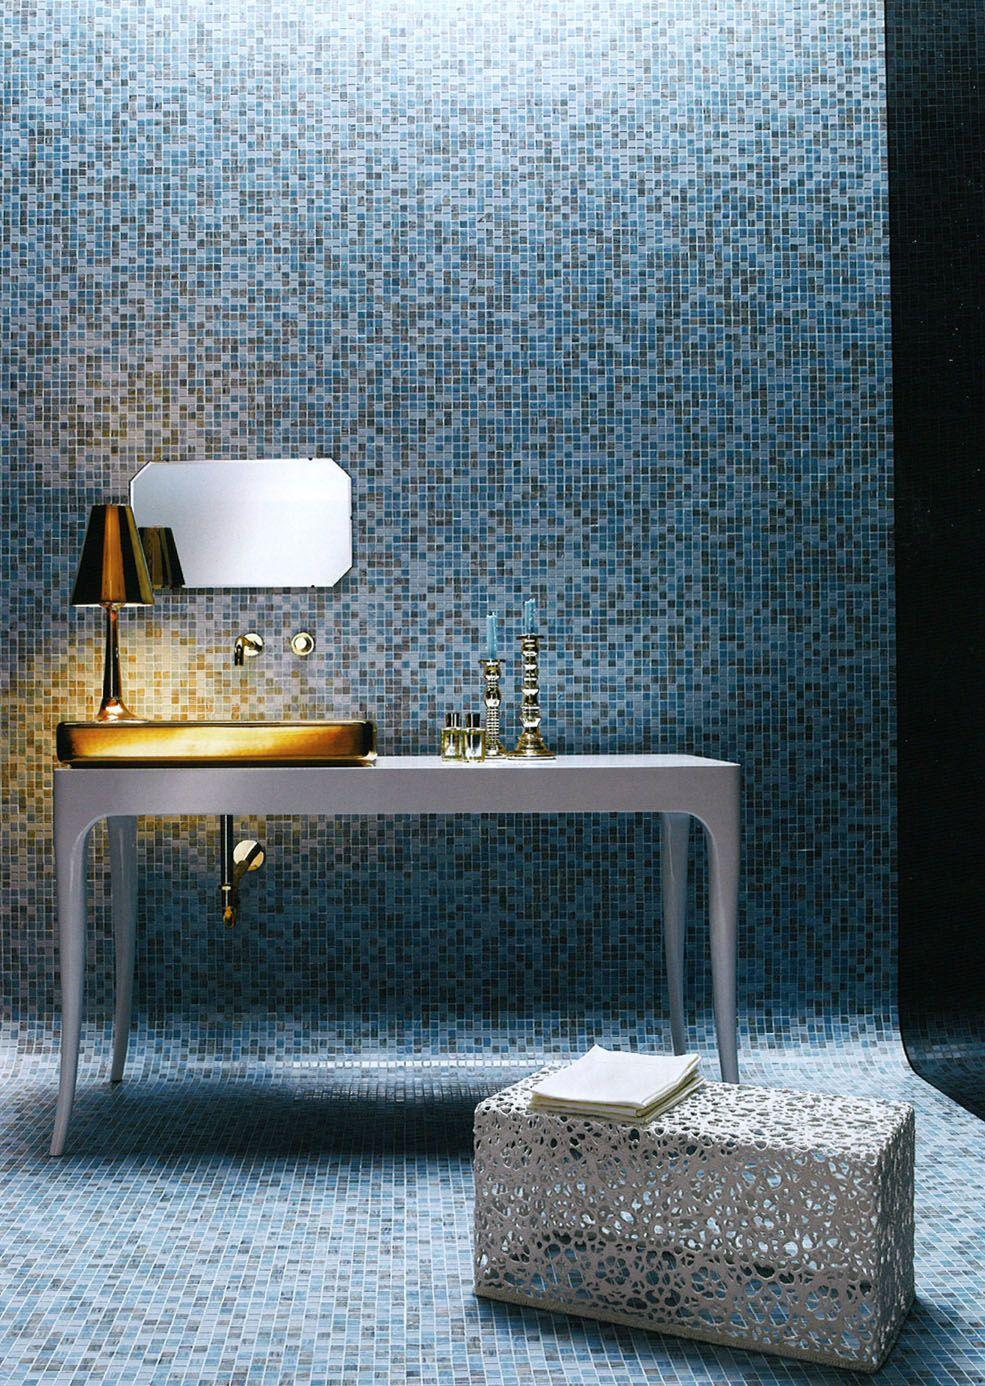 Bizassa Ornanelia | Just interior | Pinterest | Mosaics, Bath design ...